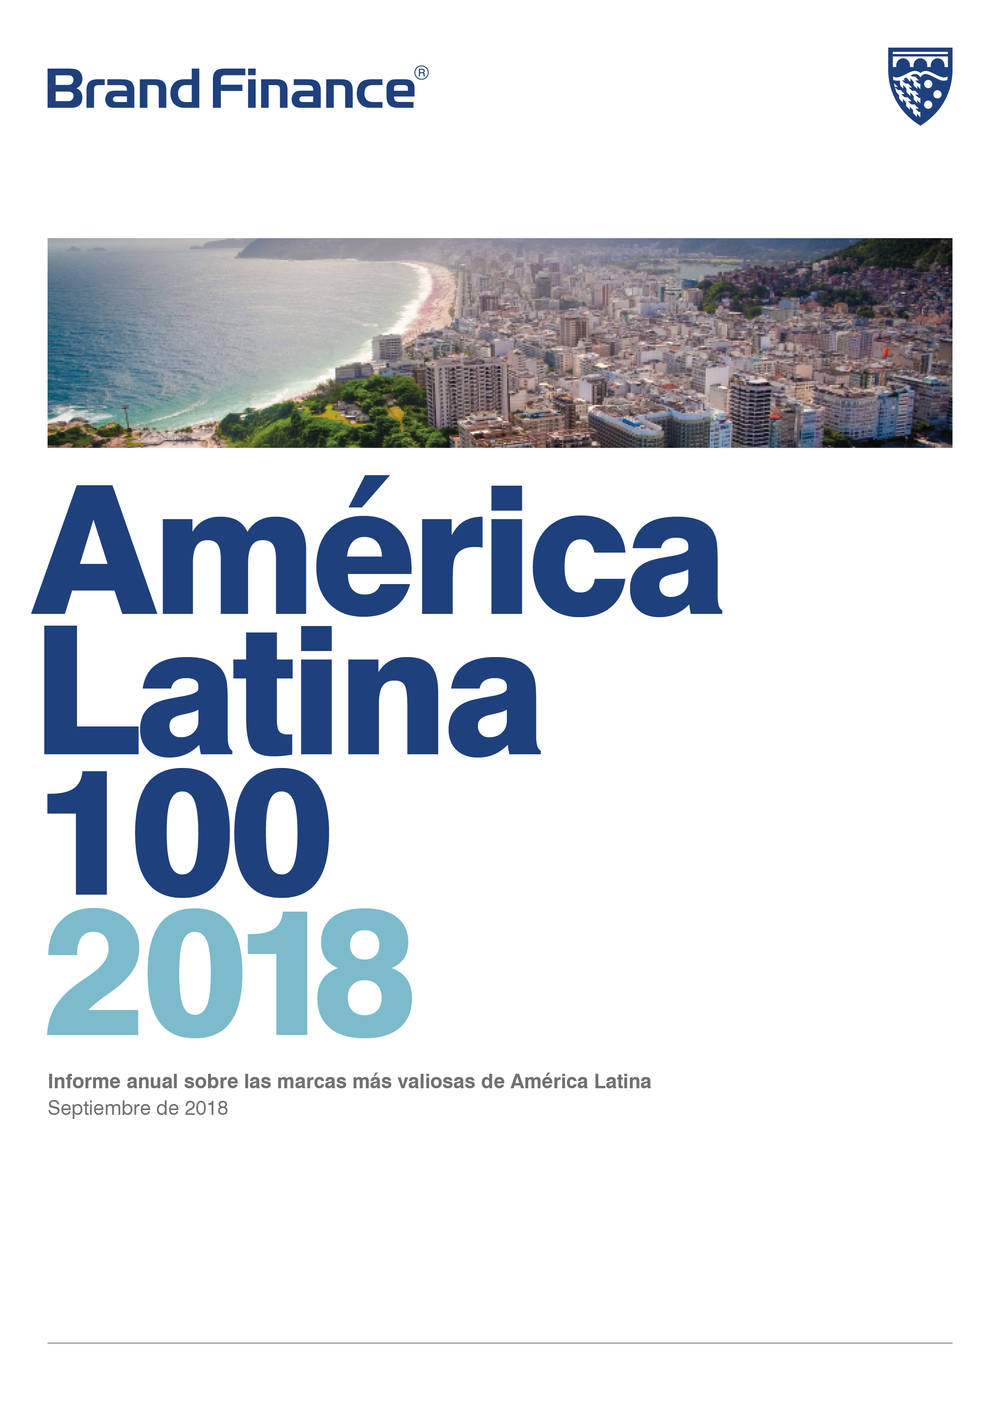 Brand Finance Latin America 100 2018